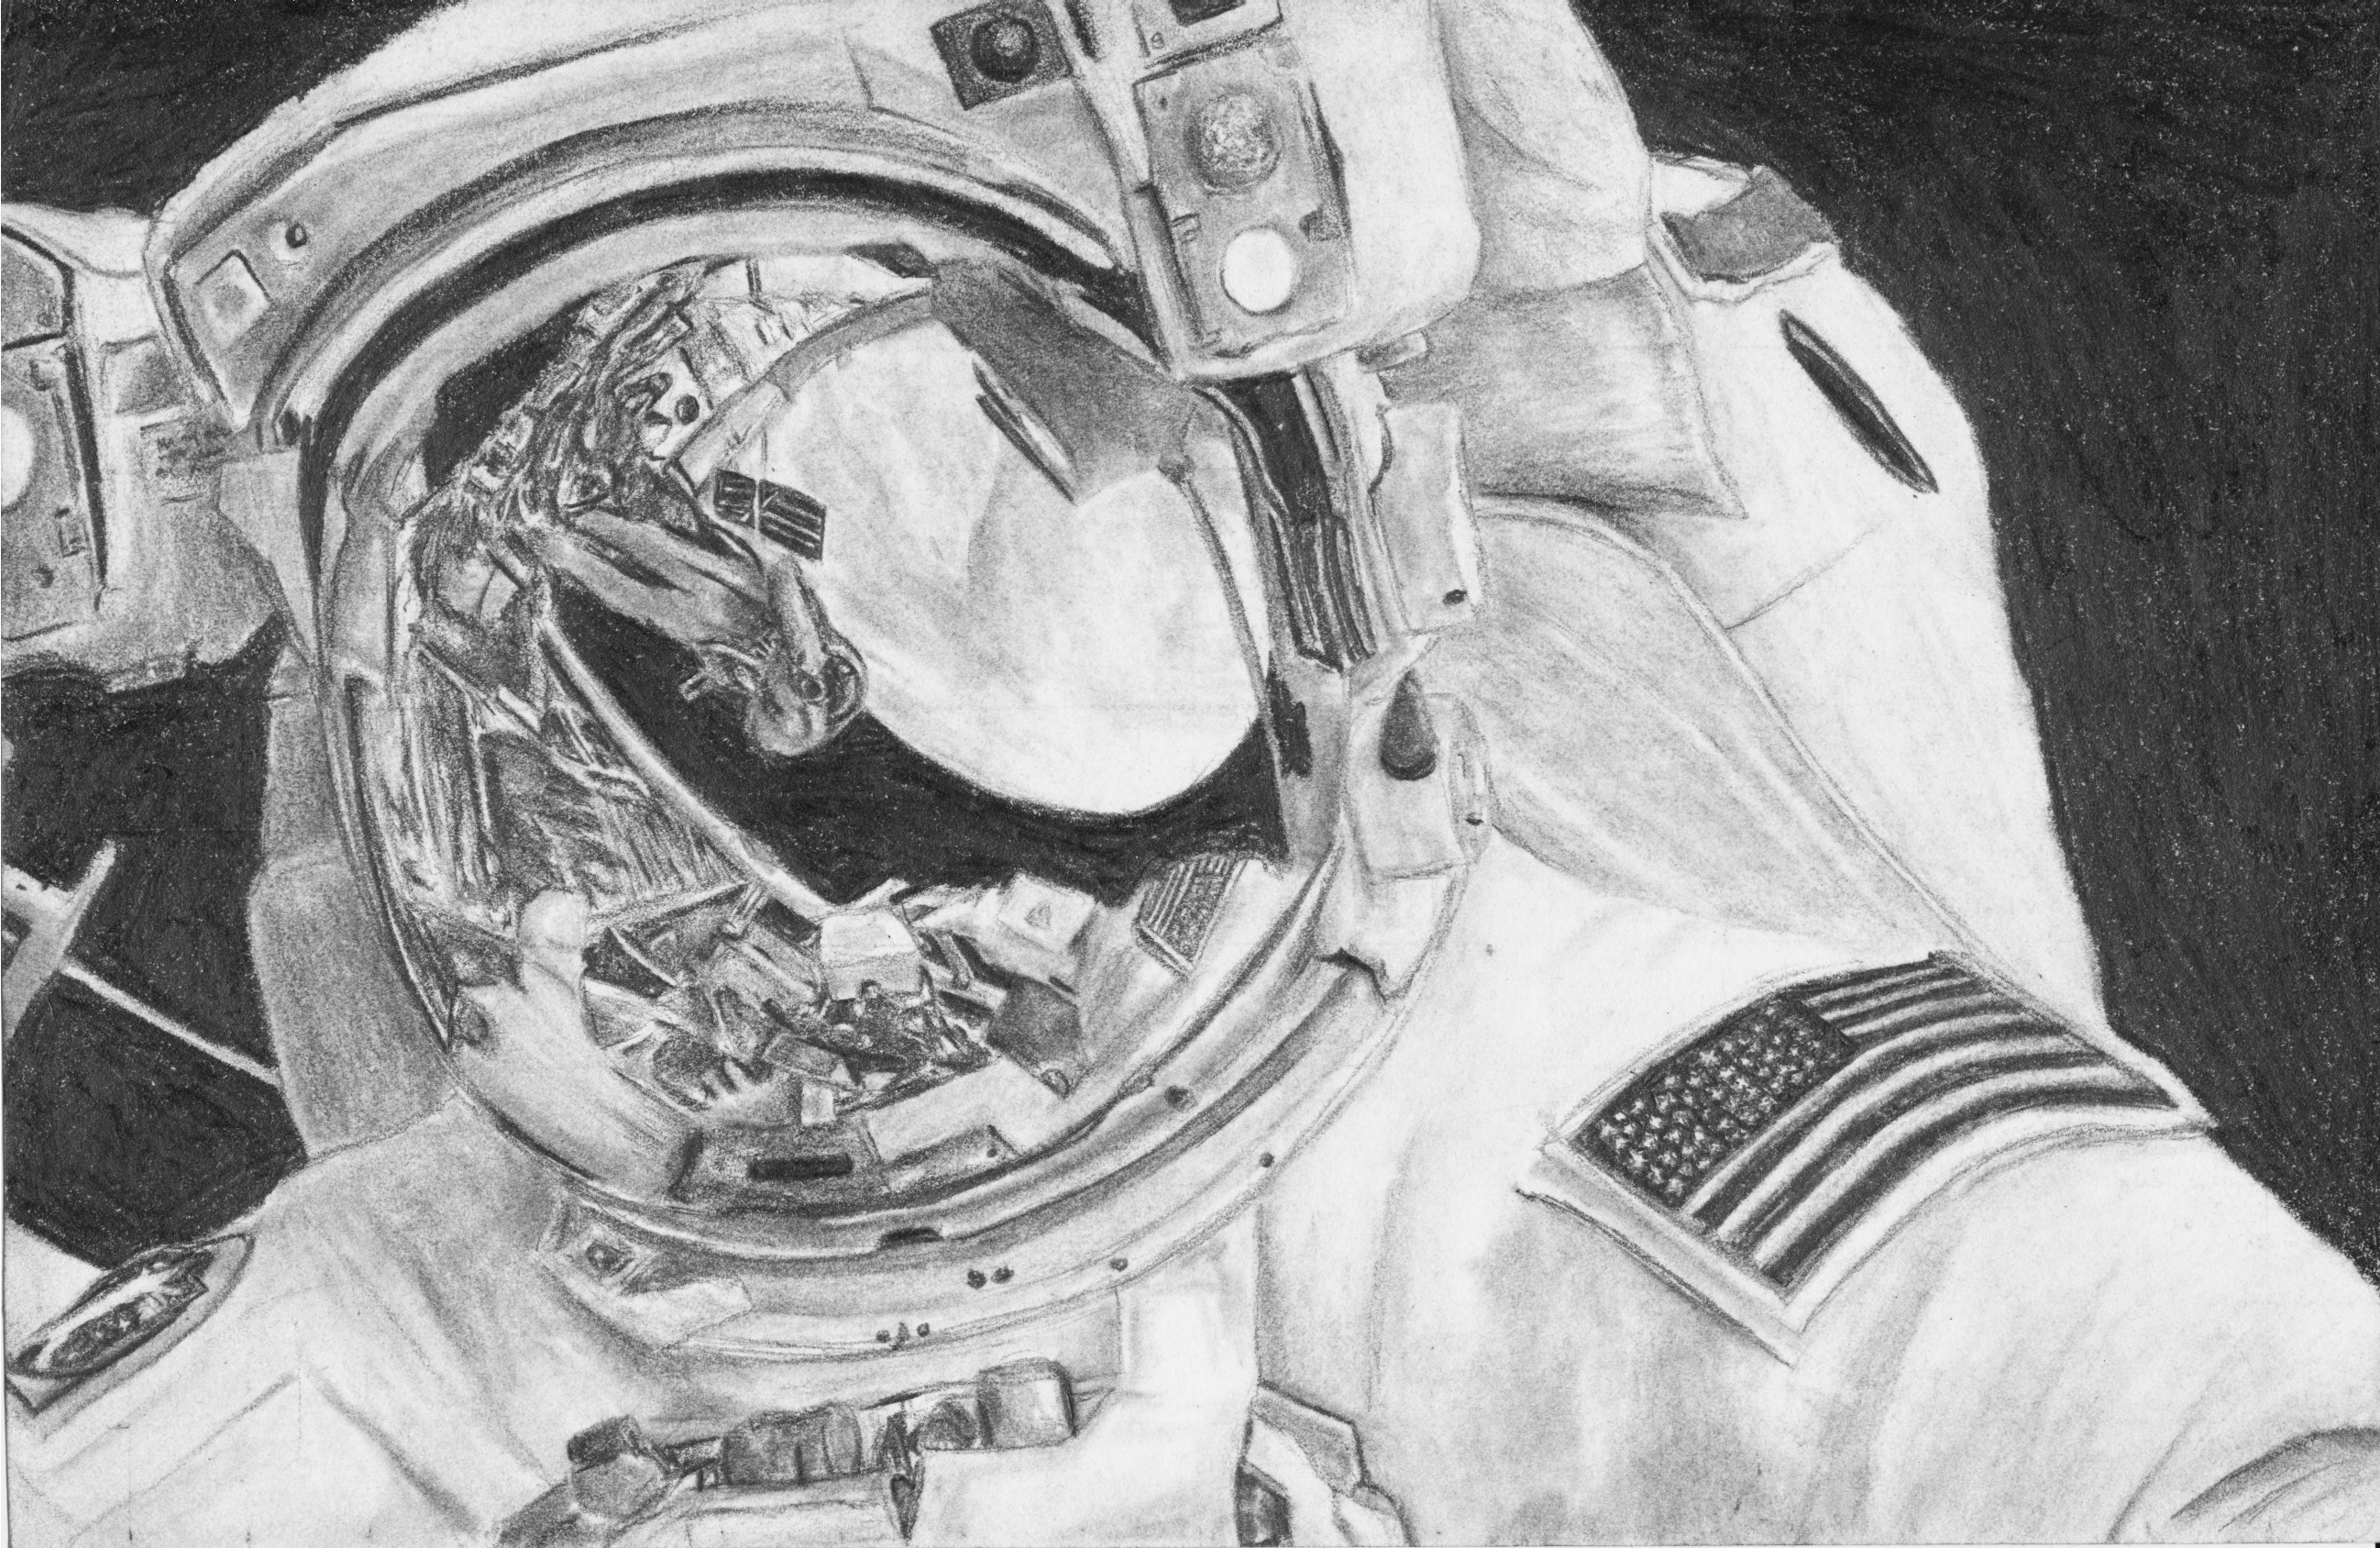 Astronaut by Bolbec on DeviantArt